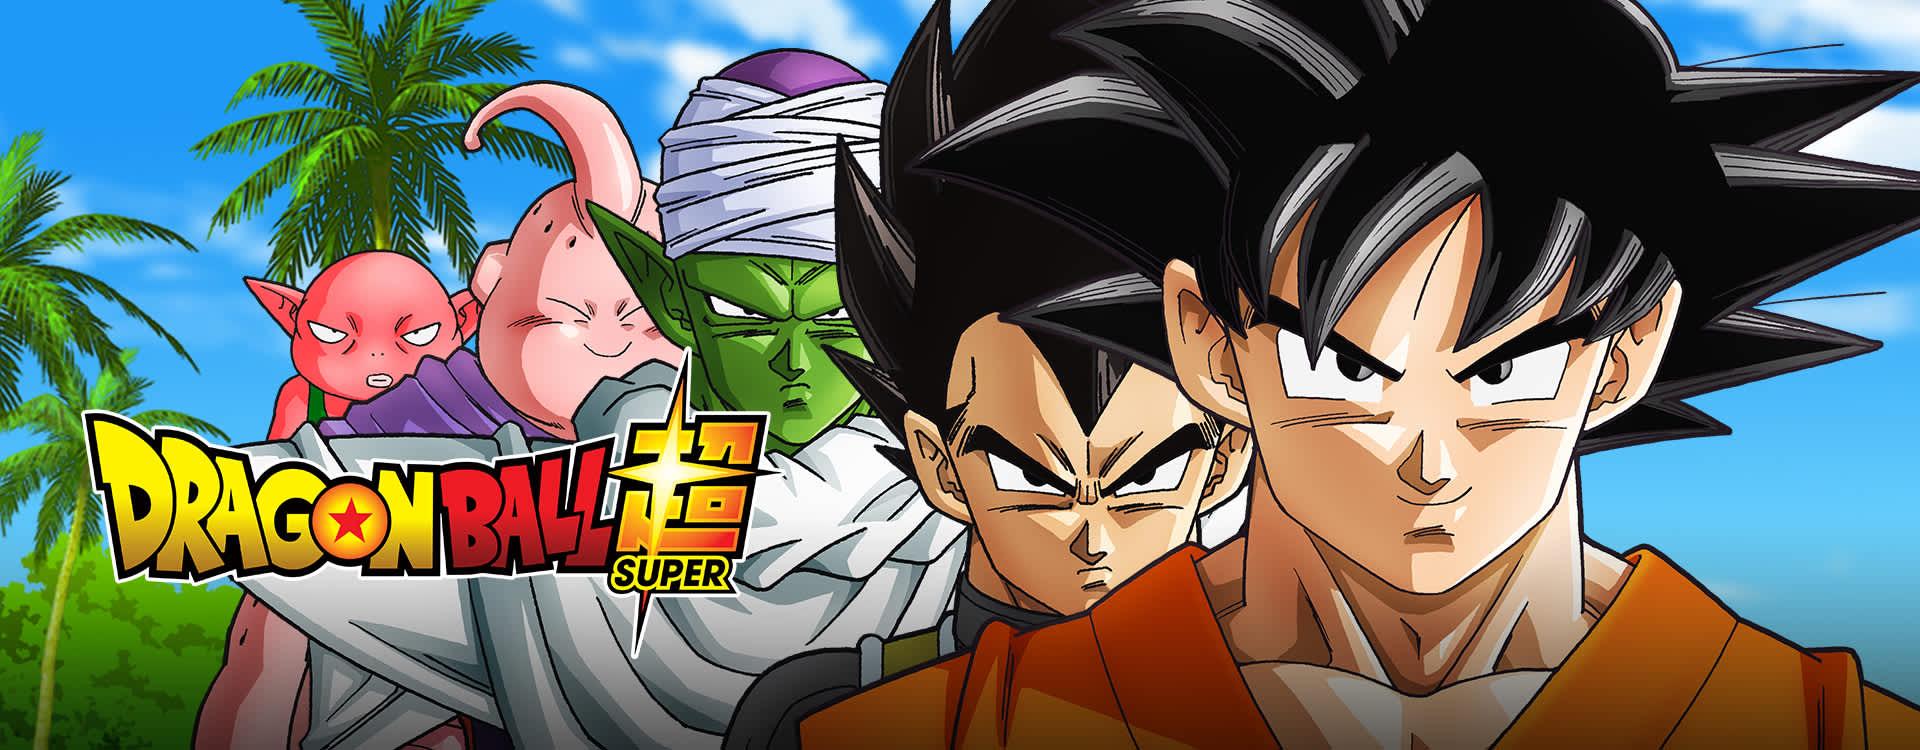 Watch Dragon Ball Super Episodes Sub Dub Action Adventure